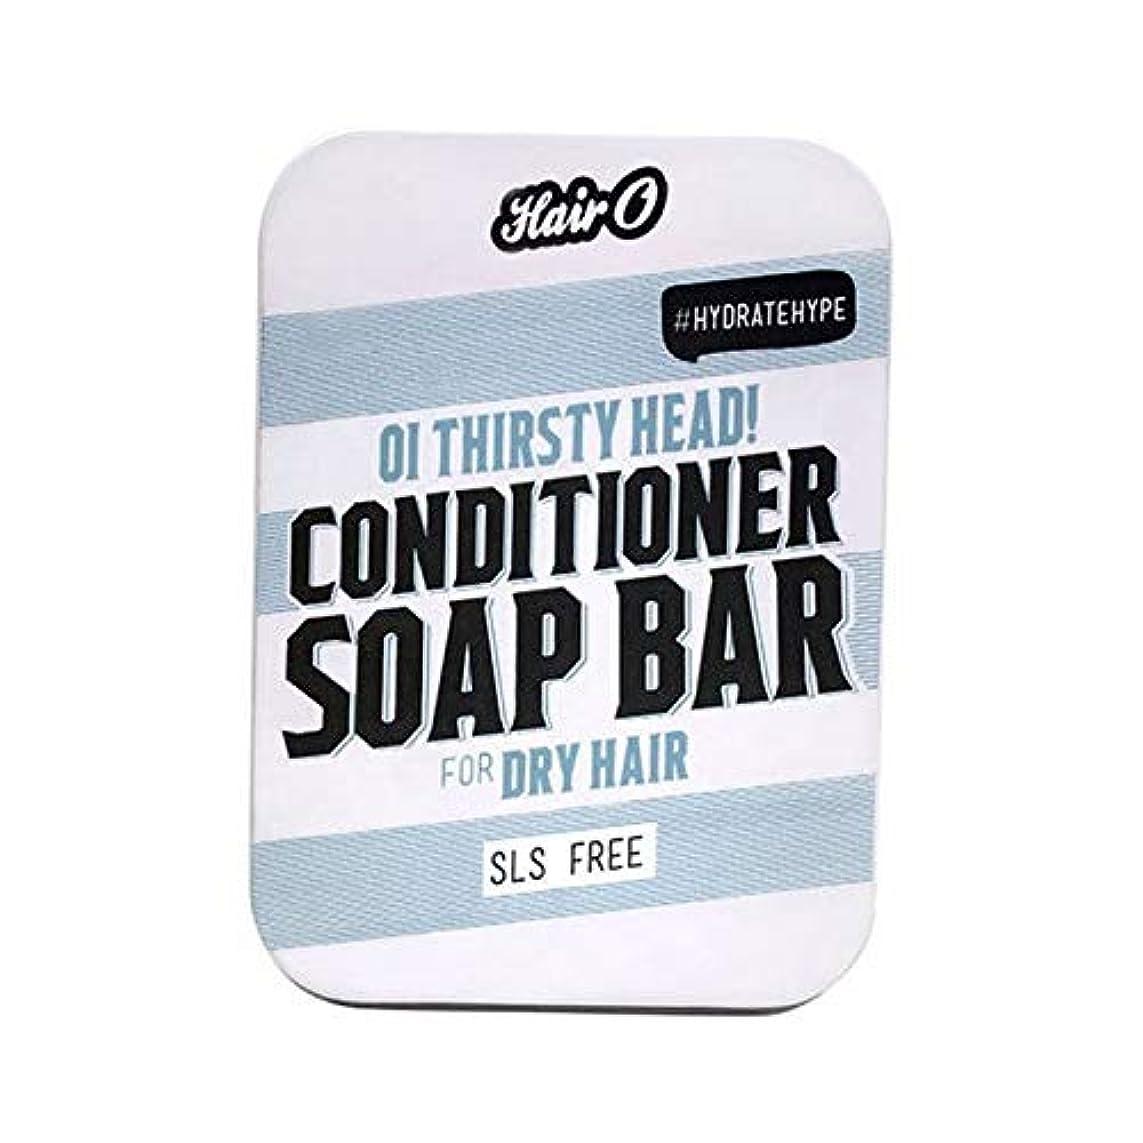 [Hair O ] 大井のどが渇いヘッドコンディショナーソープバー100グラムO毛 - Hair O Oi Thirsty Head Conditioner Soap Bar 100g [並行輸入品]